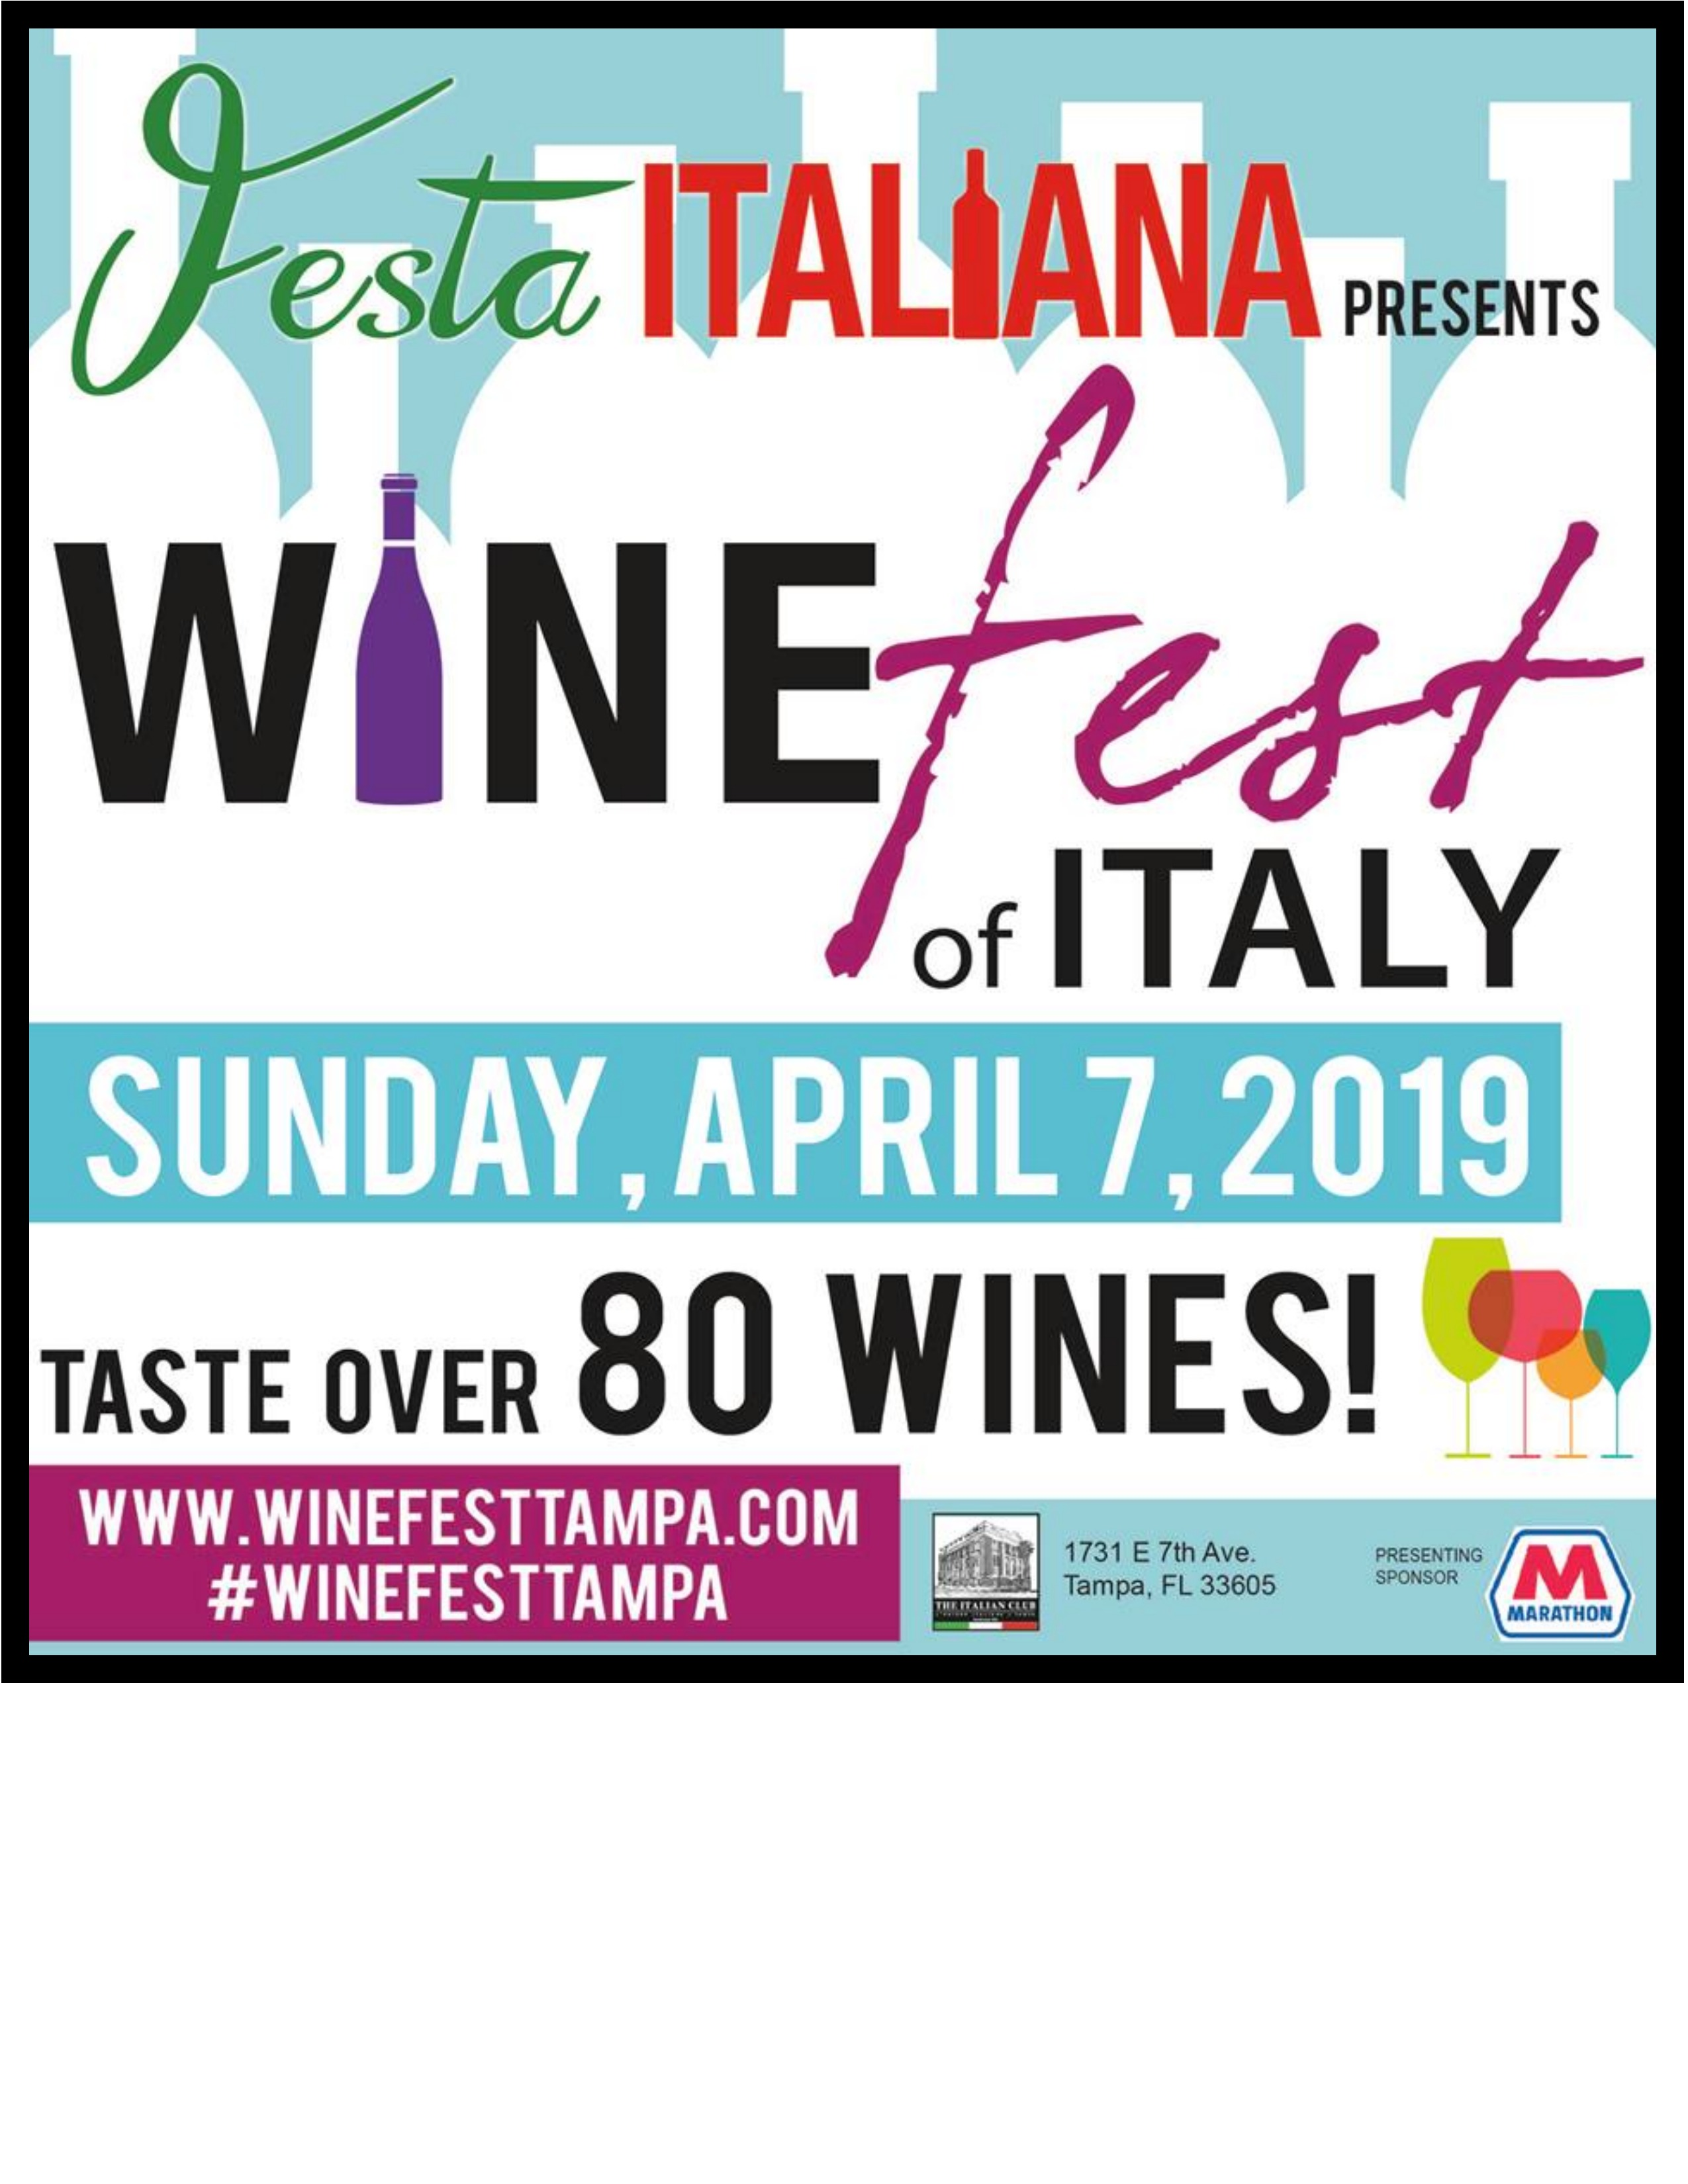 Winefest of Italy